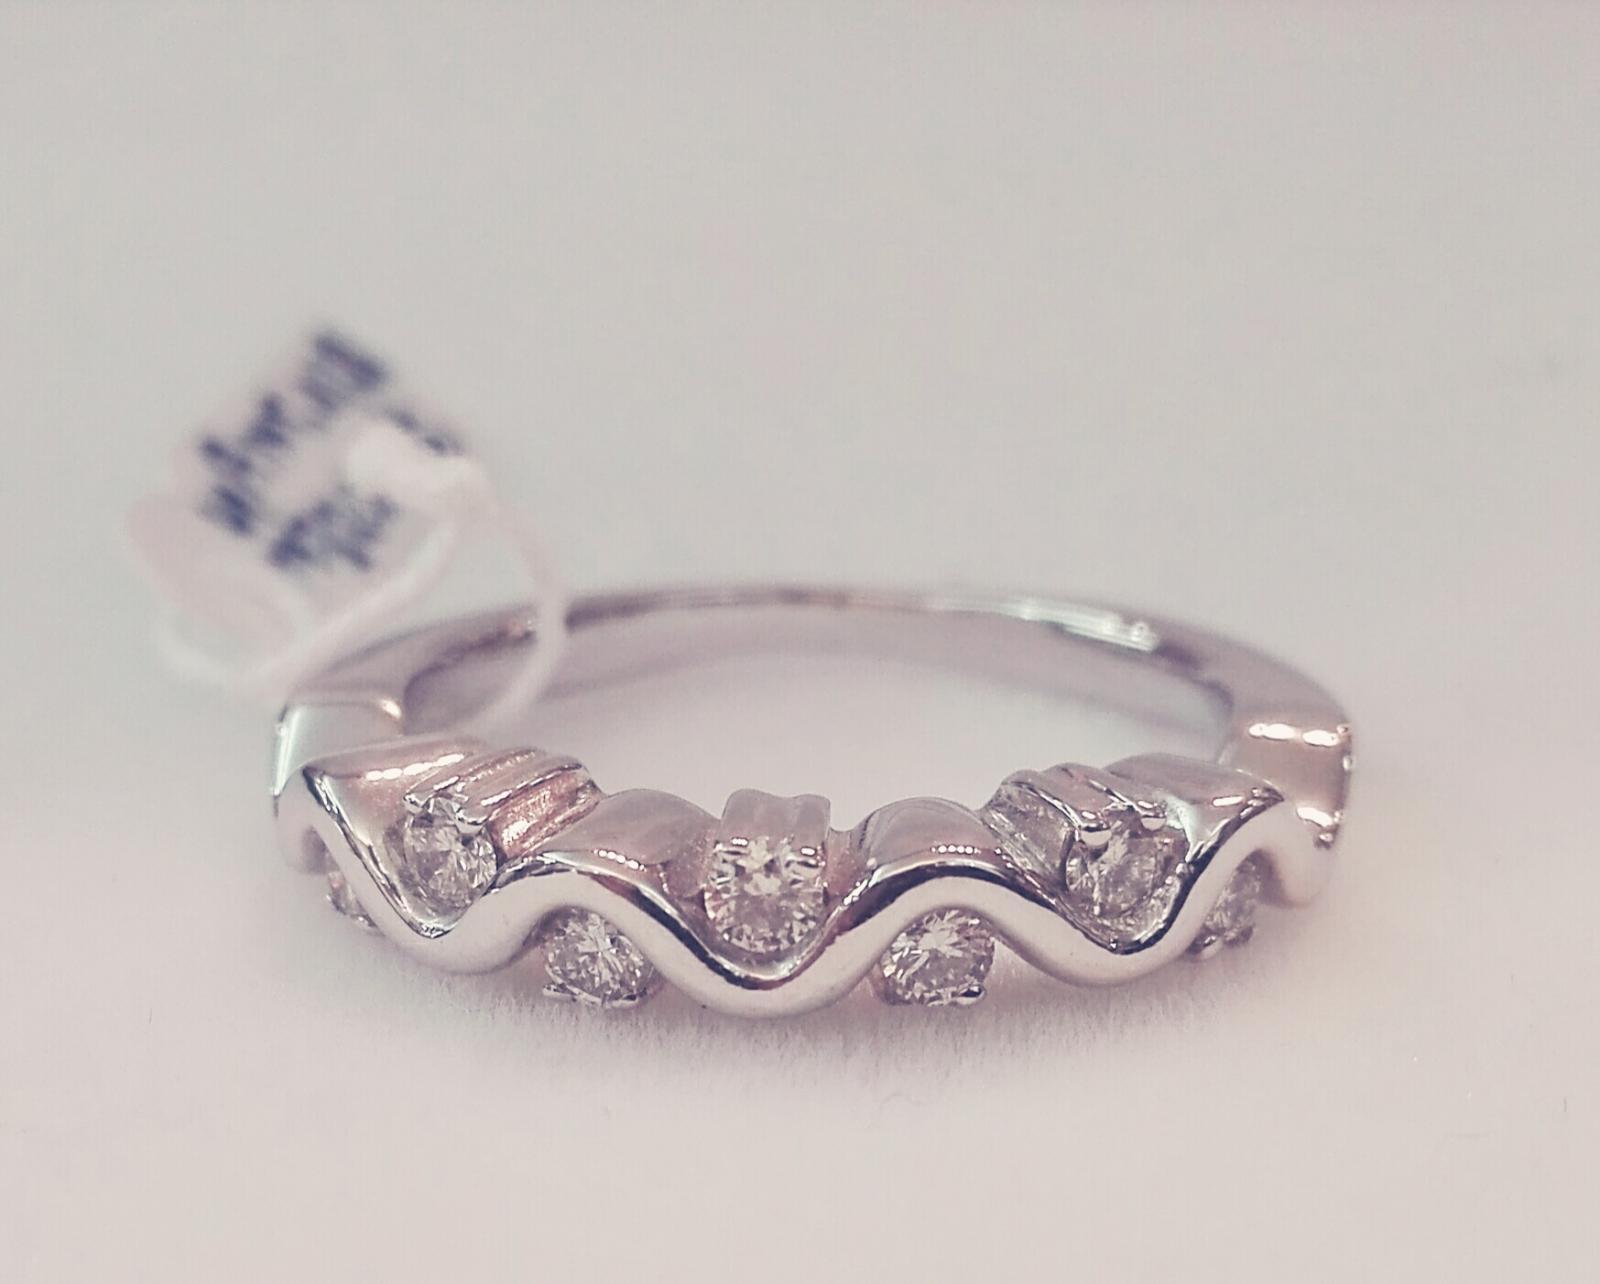 Oferta Anillo 7 Diamantes Oro Blanco Ideal Compromiso